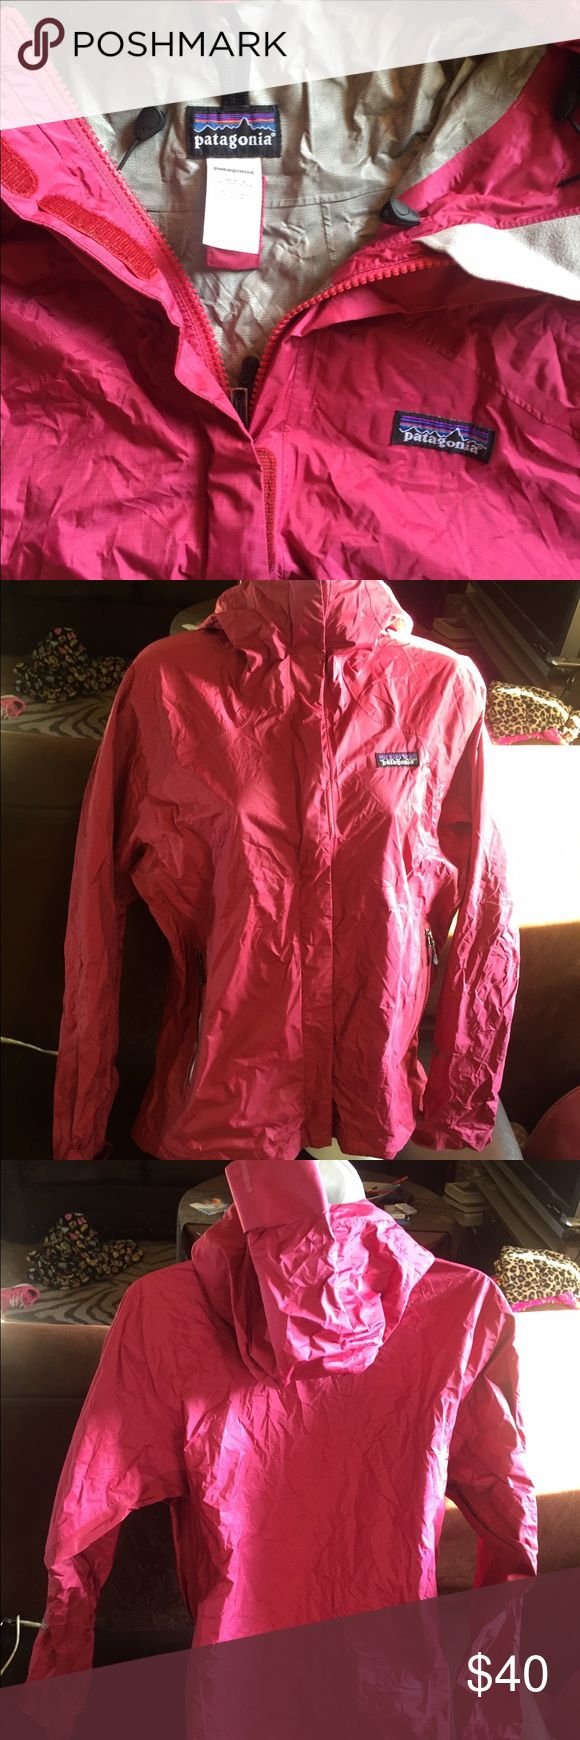 Women's Patagonia rain jacket M Women's paragonia rain jacket M size Patagonia Jackets & Coats Utility Jackets